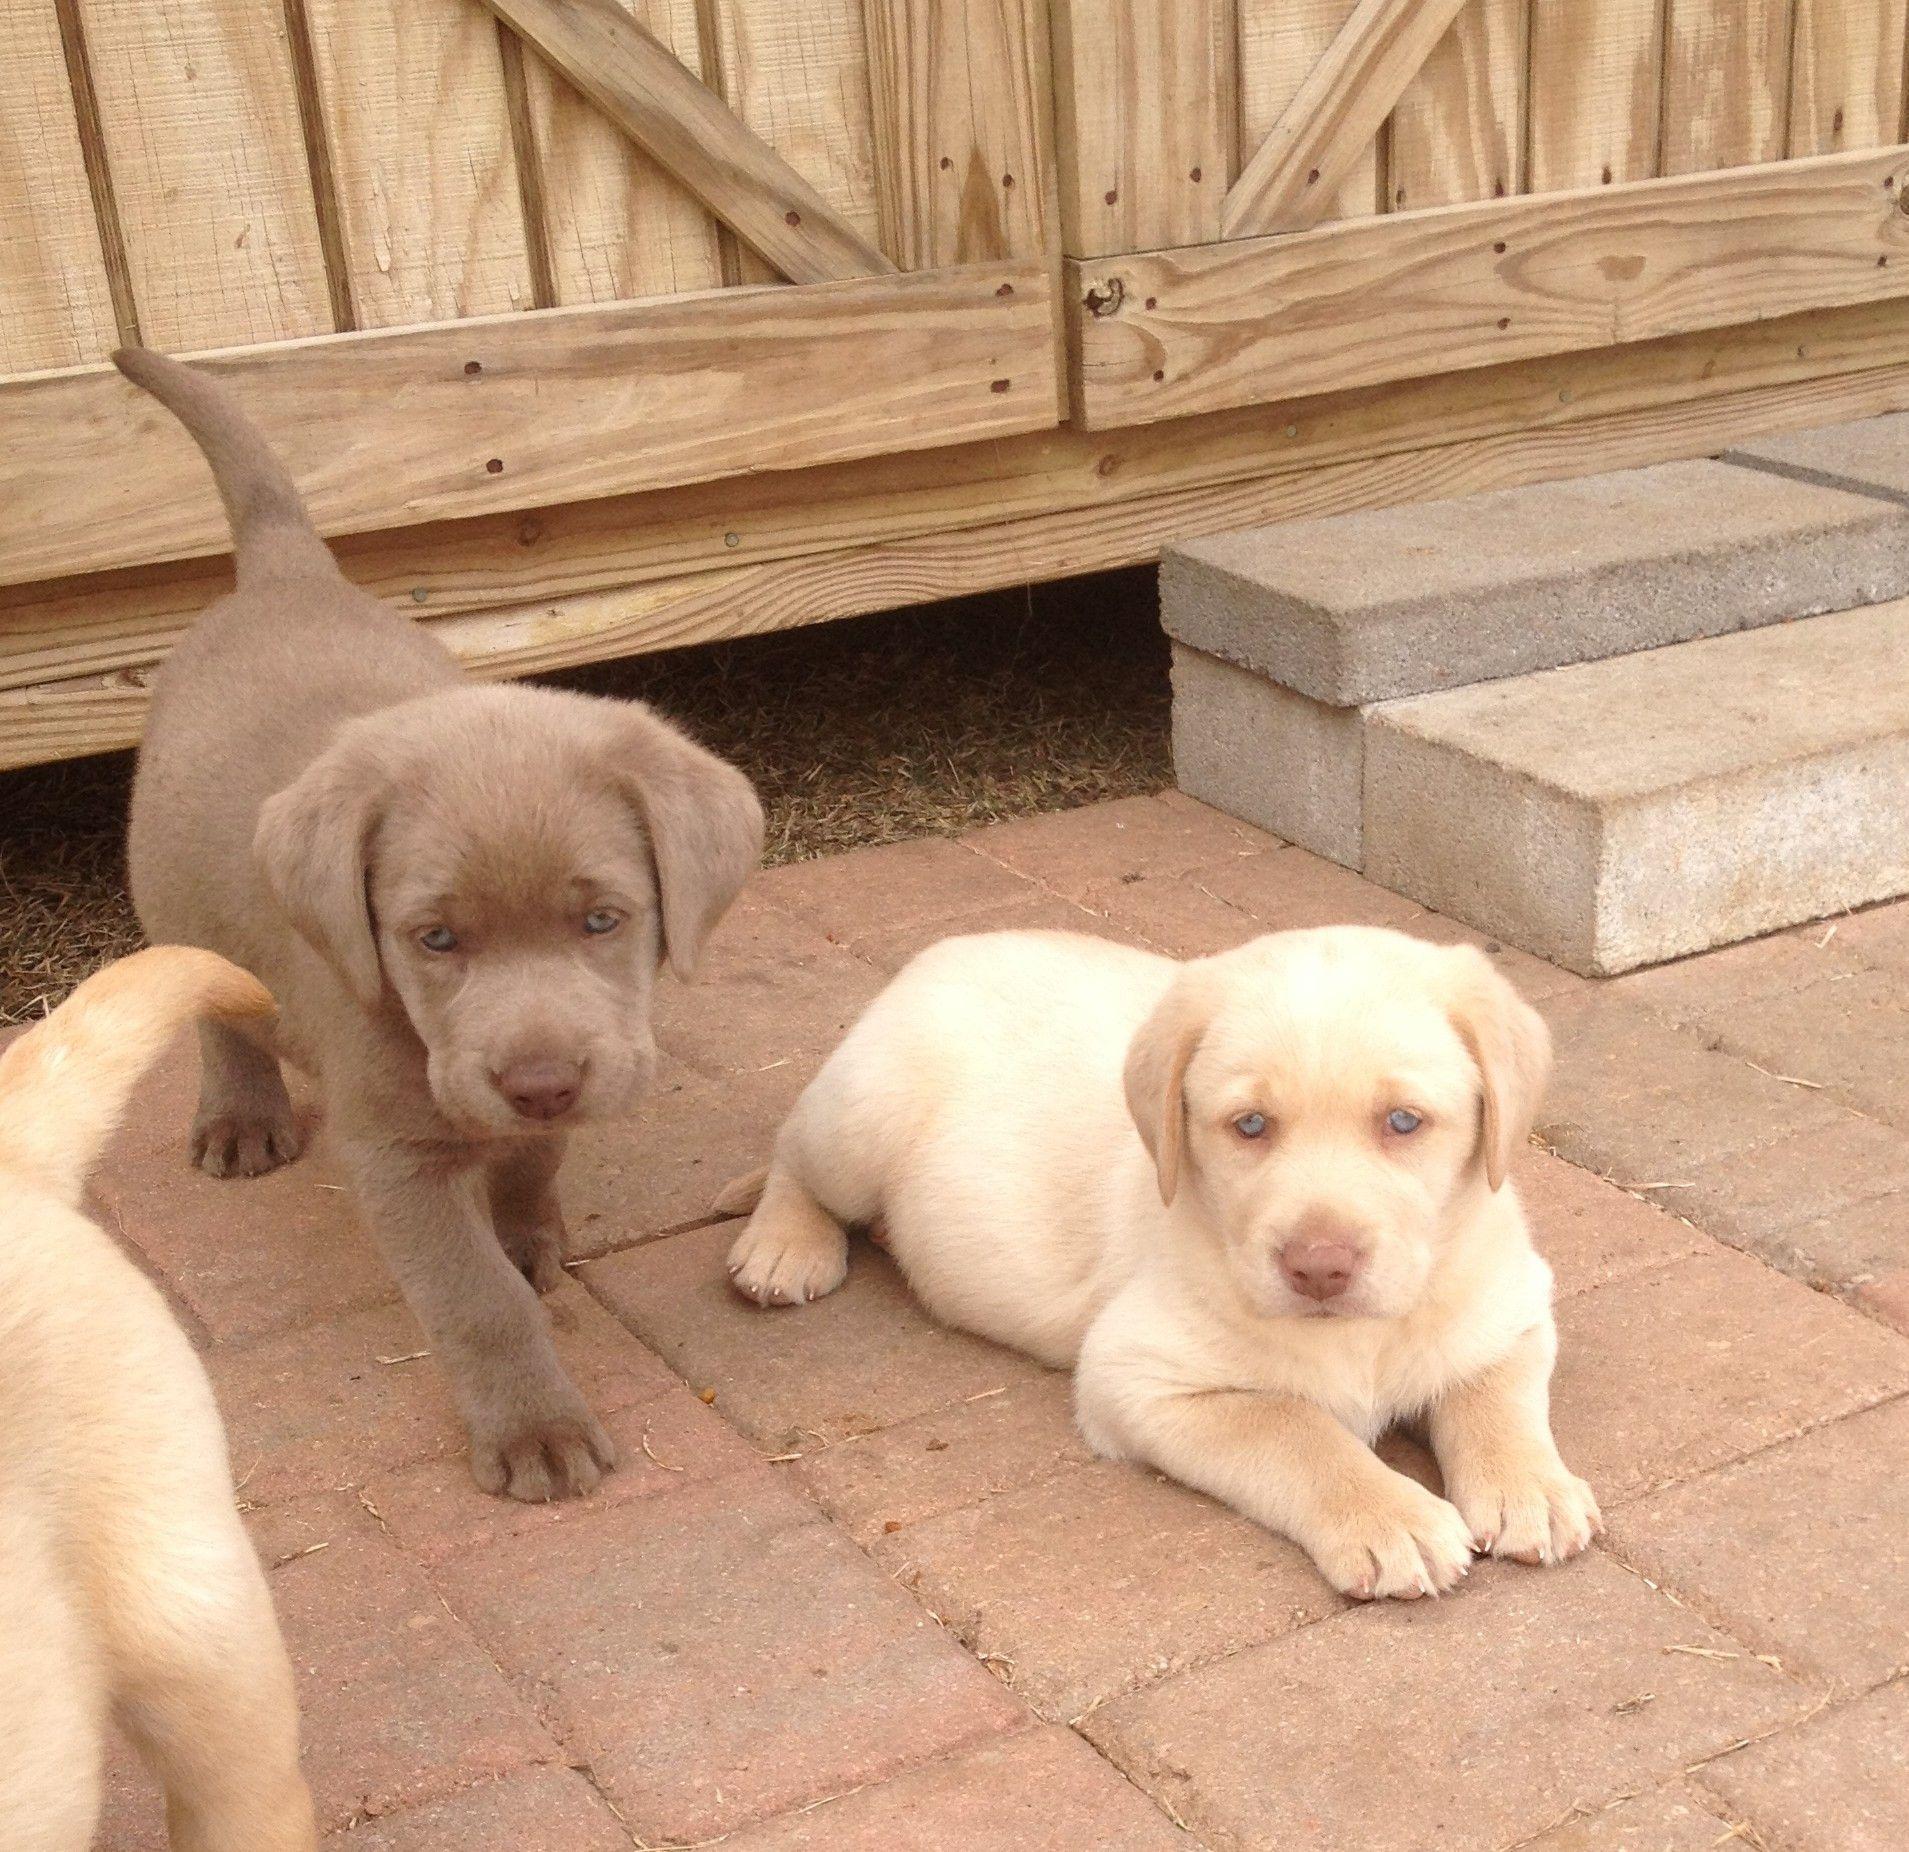 Labrador Retriever Intelligent And Fun Loving Labrador Retriever Golden Labrador Puppies Labrador